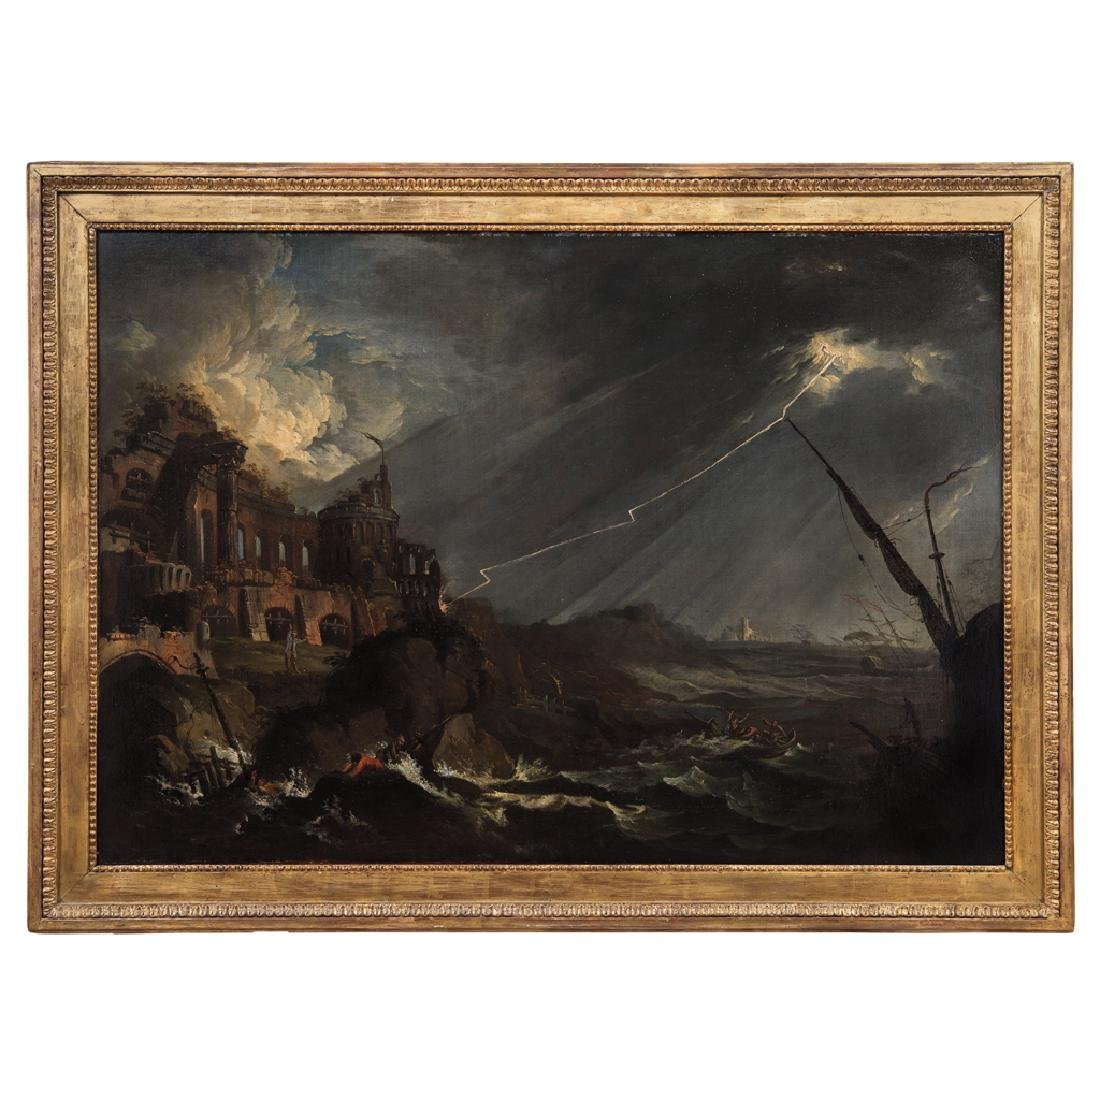 FRANCESCO FIDANZA (ITALY, 1747-1819). TEMPEST. Oil on